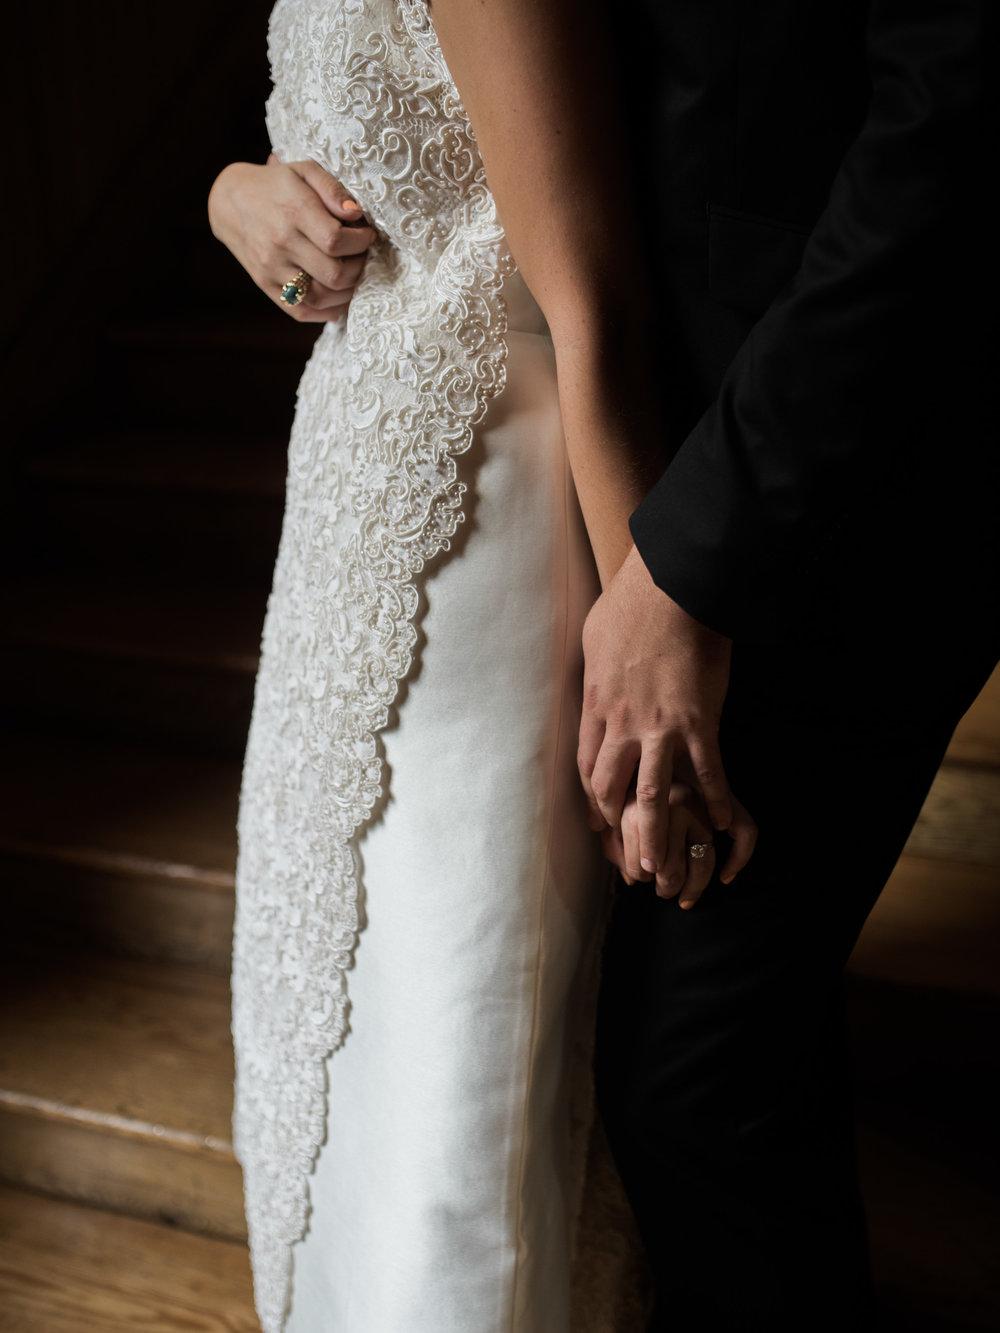 Gladstone-Toronto-Wedding-99-sudbury-25.jpg